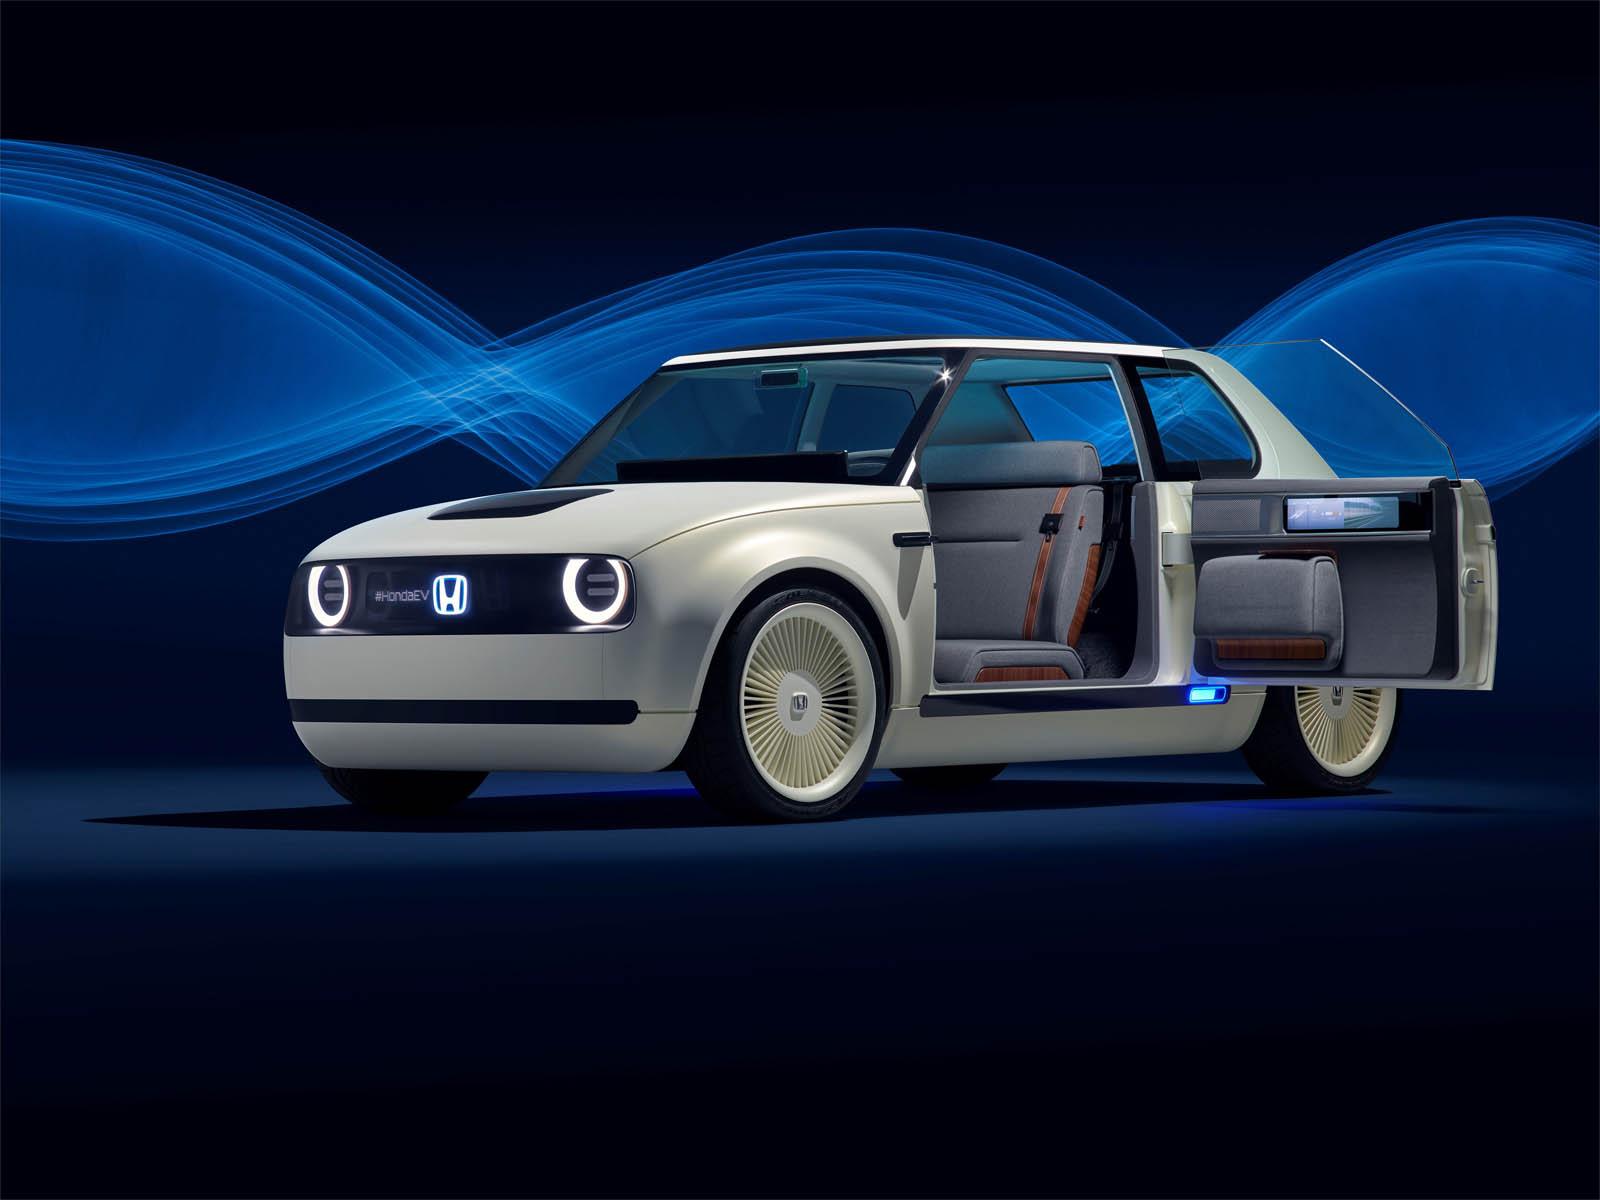 113865_Honda_Urban_EV_Concept_unveiled_at_the_Frankfurt_Motor_Show copy.jpg